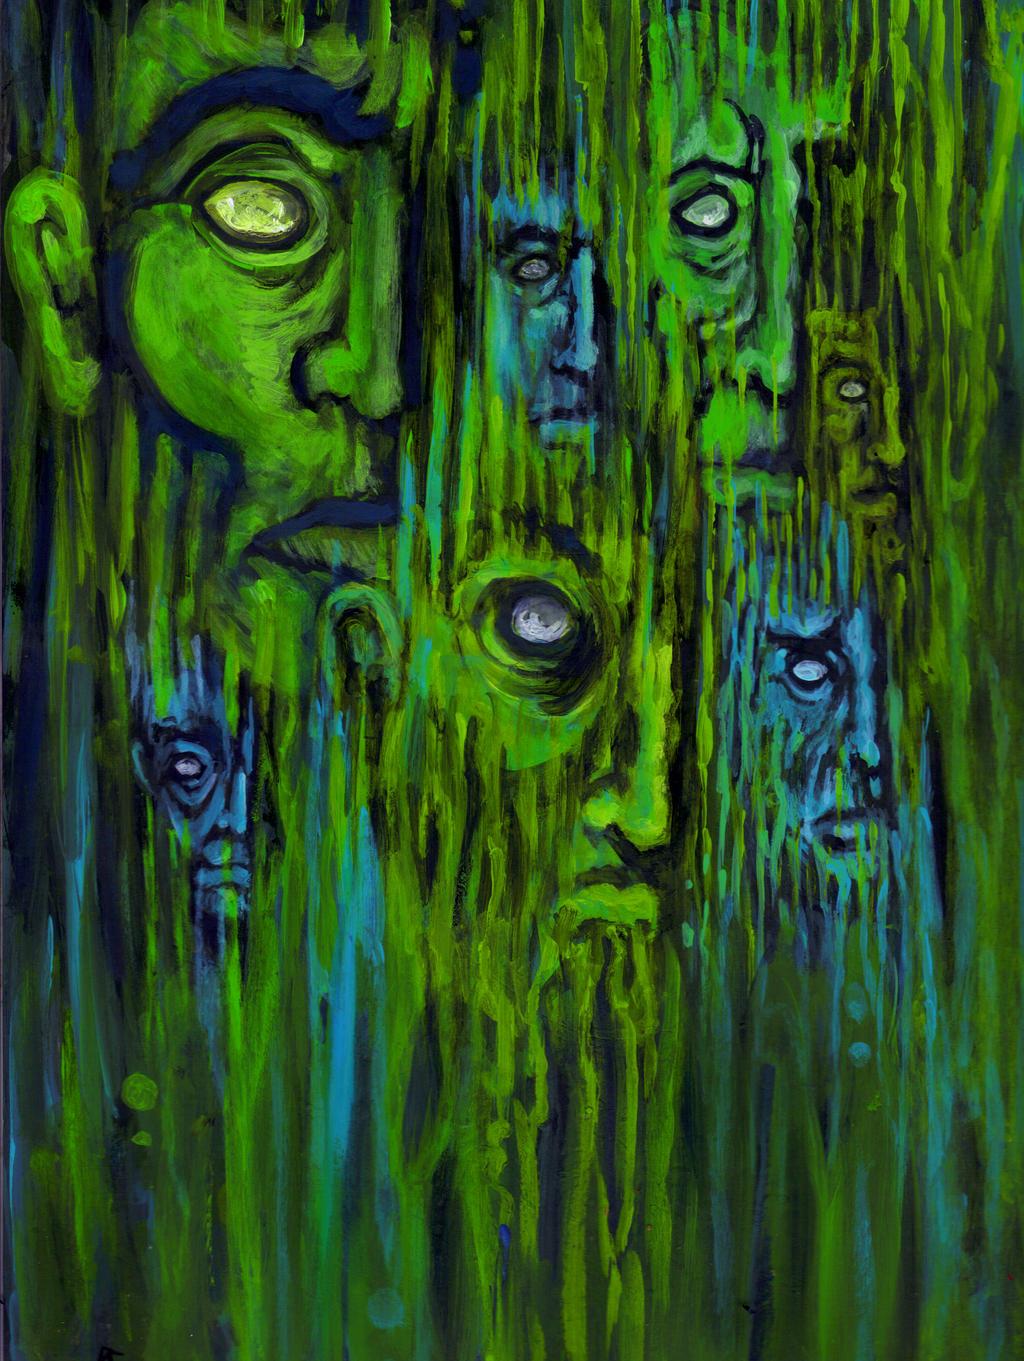 Strange Signals by Ustranga